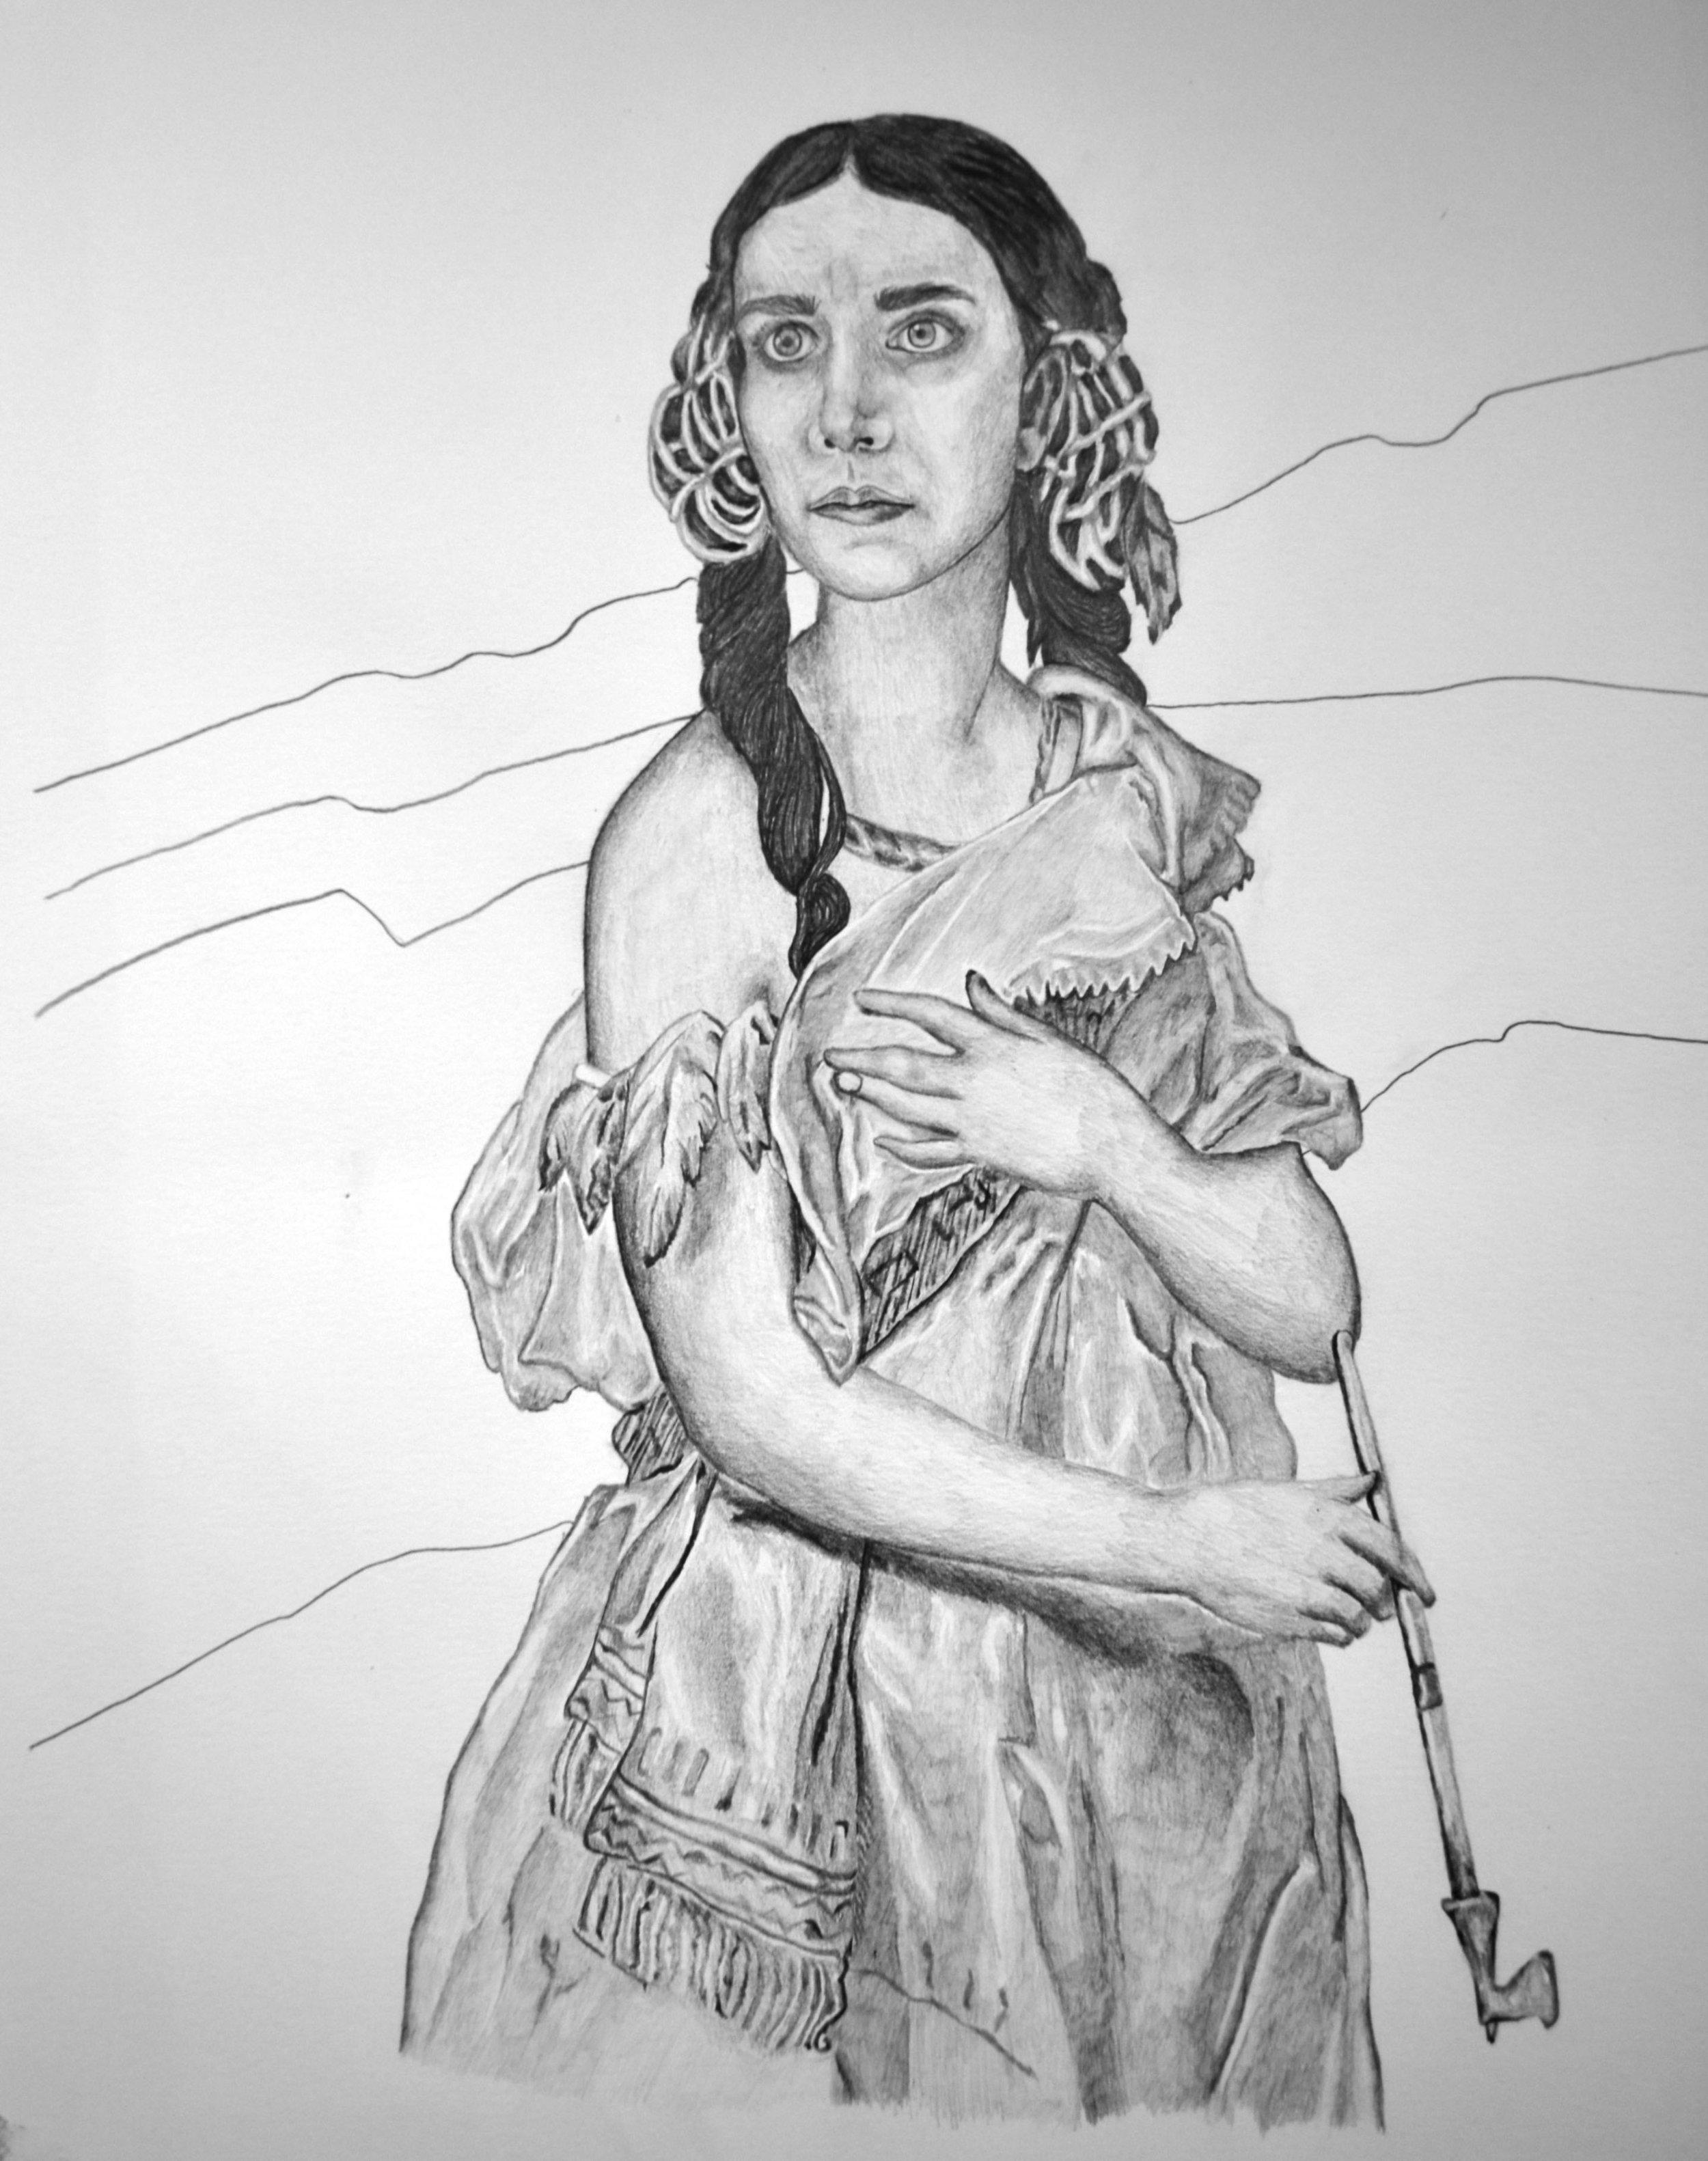 Self Portrait as Pocahontas, 2011